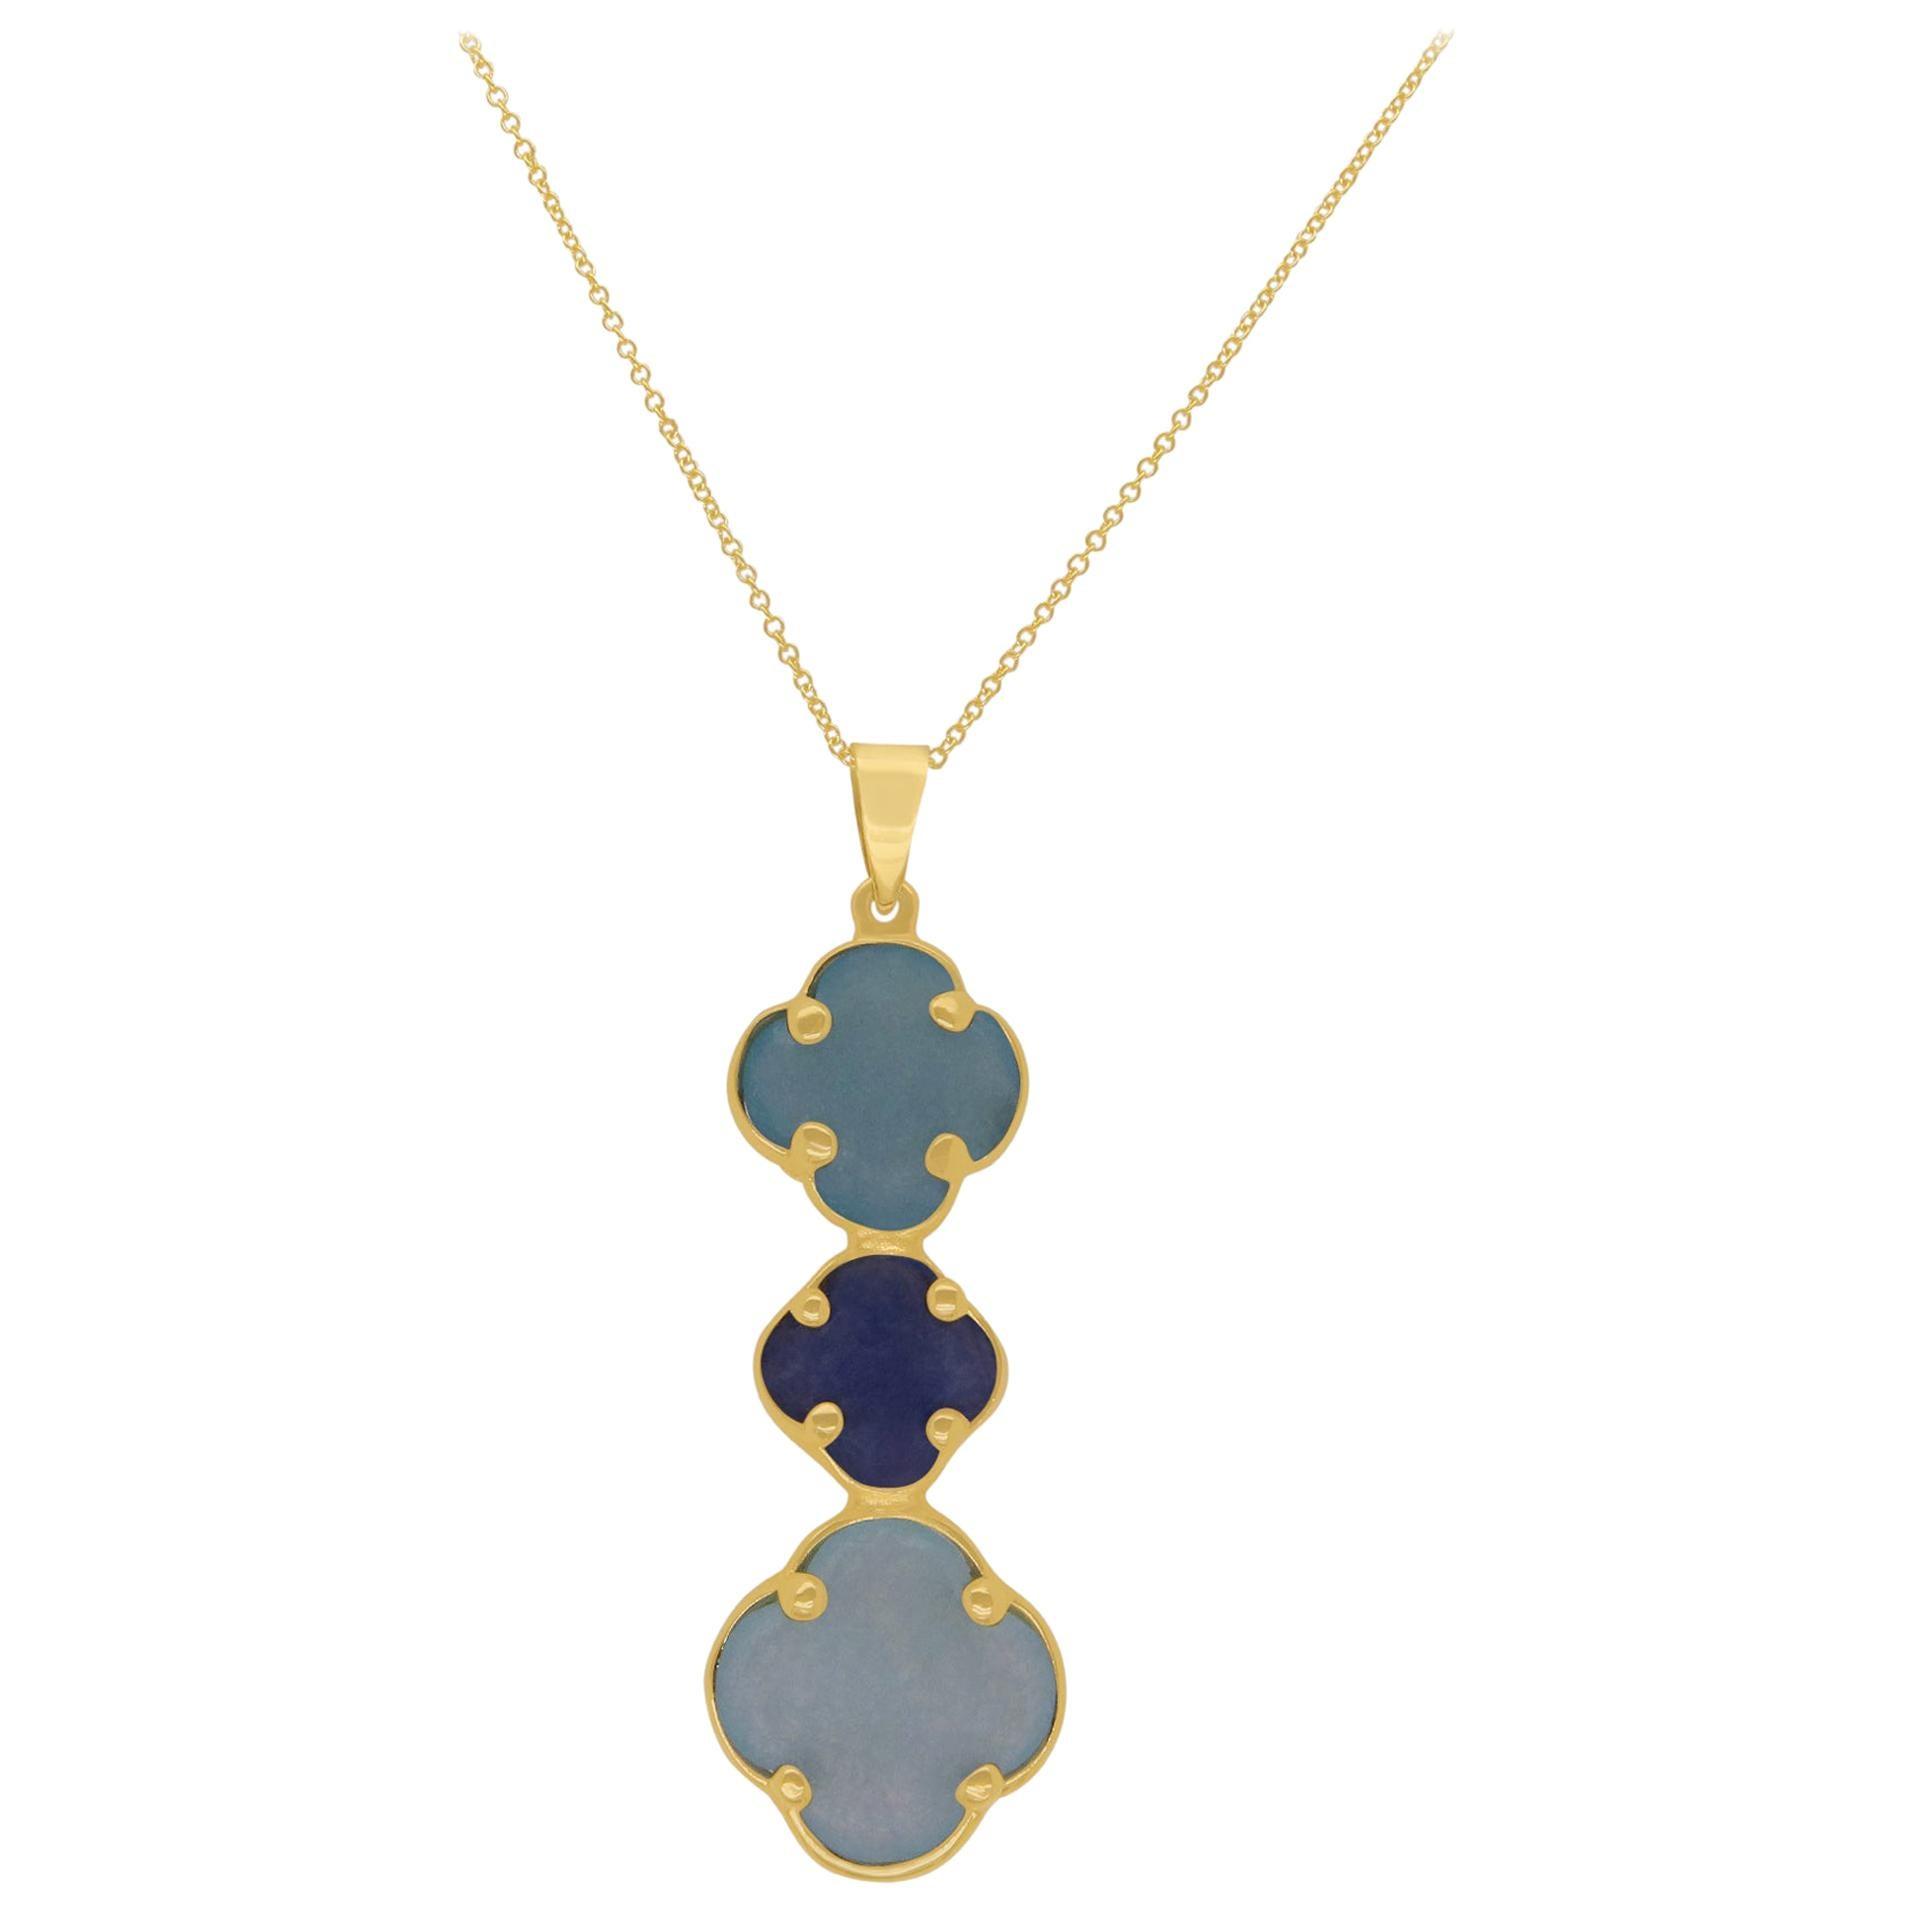 Three Drop Clover Shaped Multi-Gemstone Pendant Necklace 14K Yellow Gold